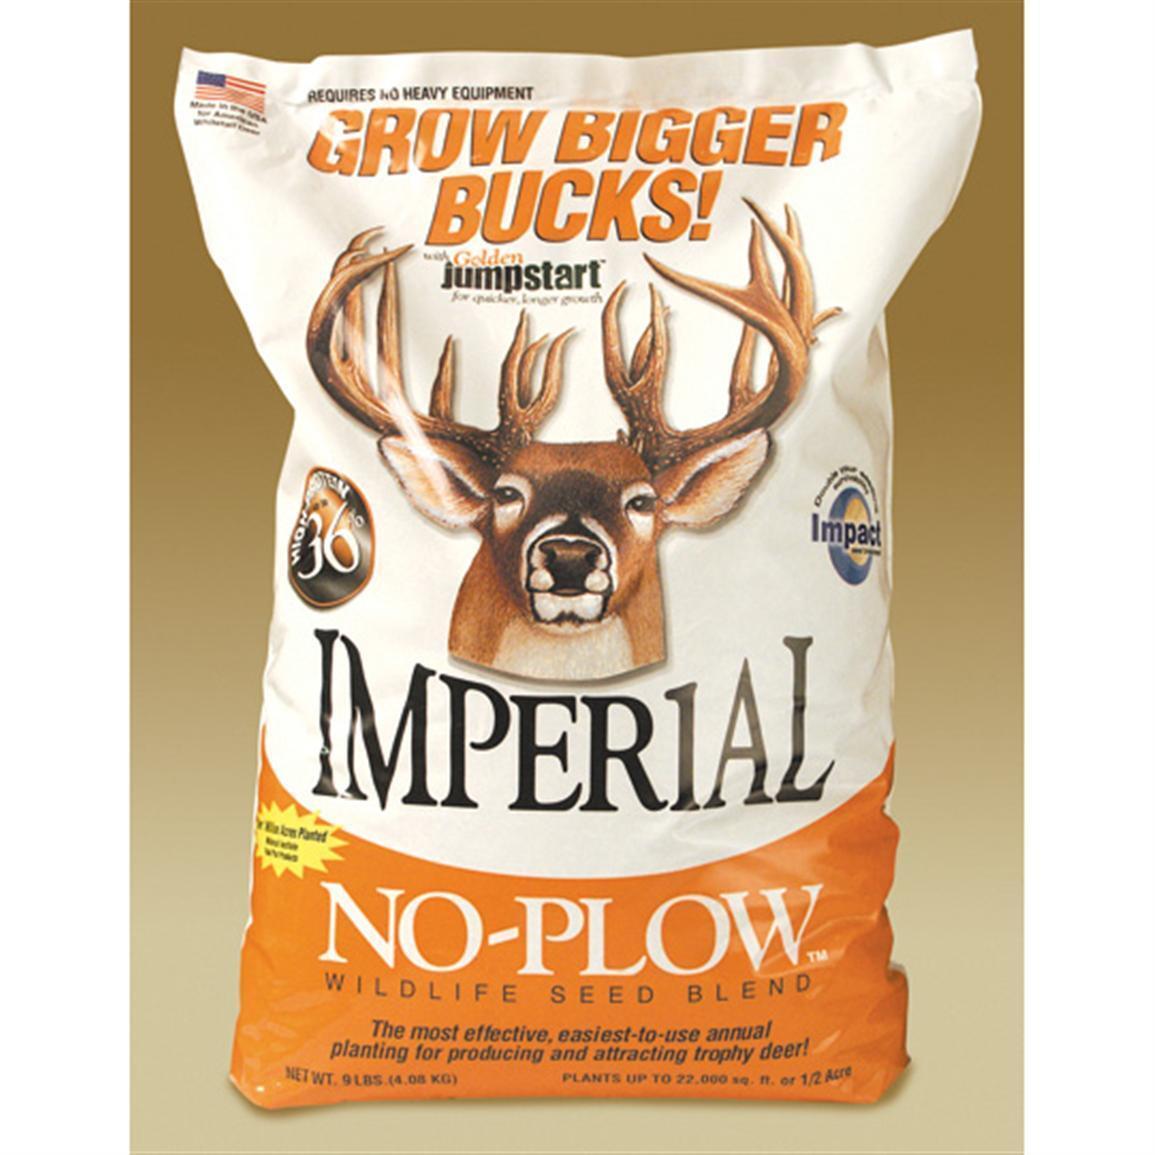 Imperial No-Plow No-Plow No-Plow Lebensmittel Plot Samen - 11.3kg Kg 2345c6